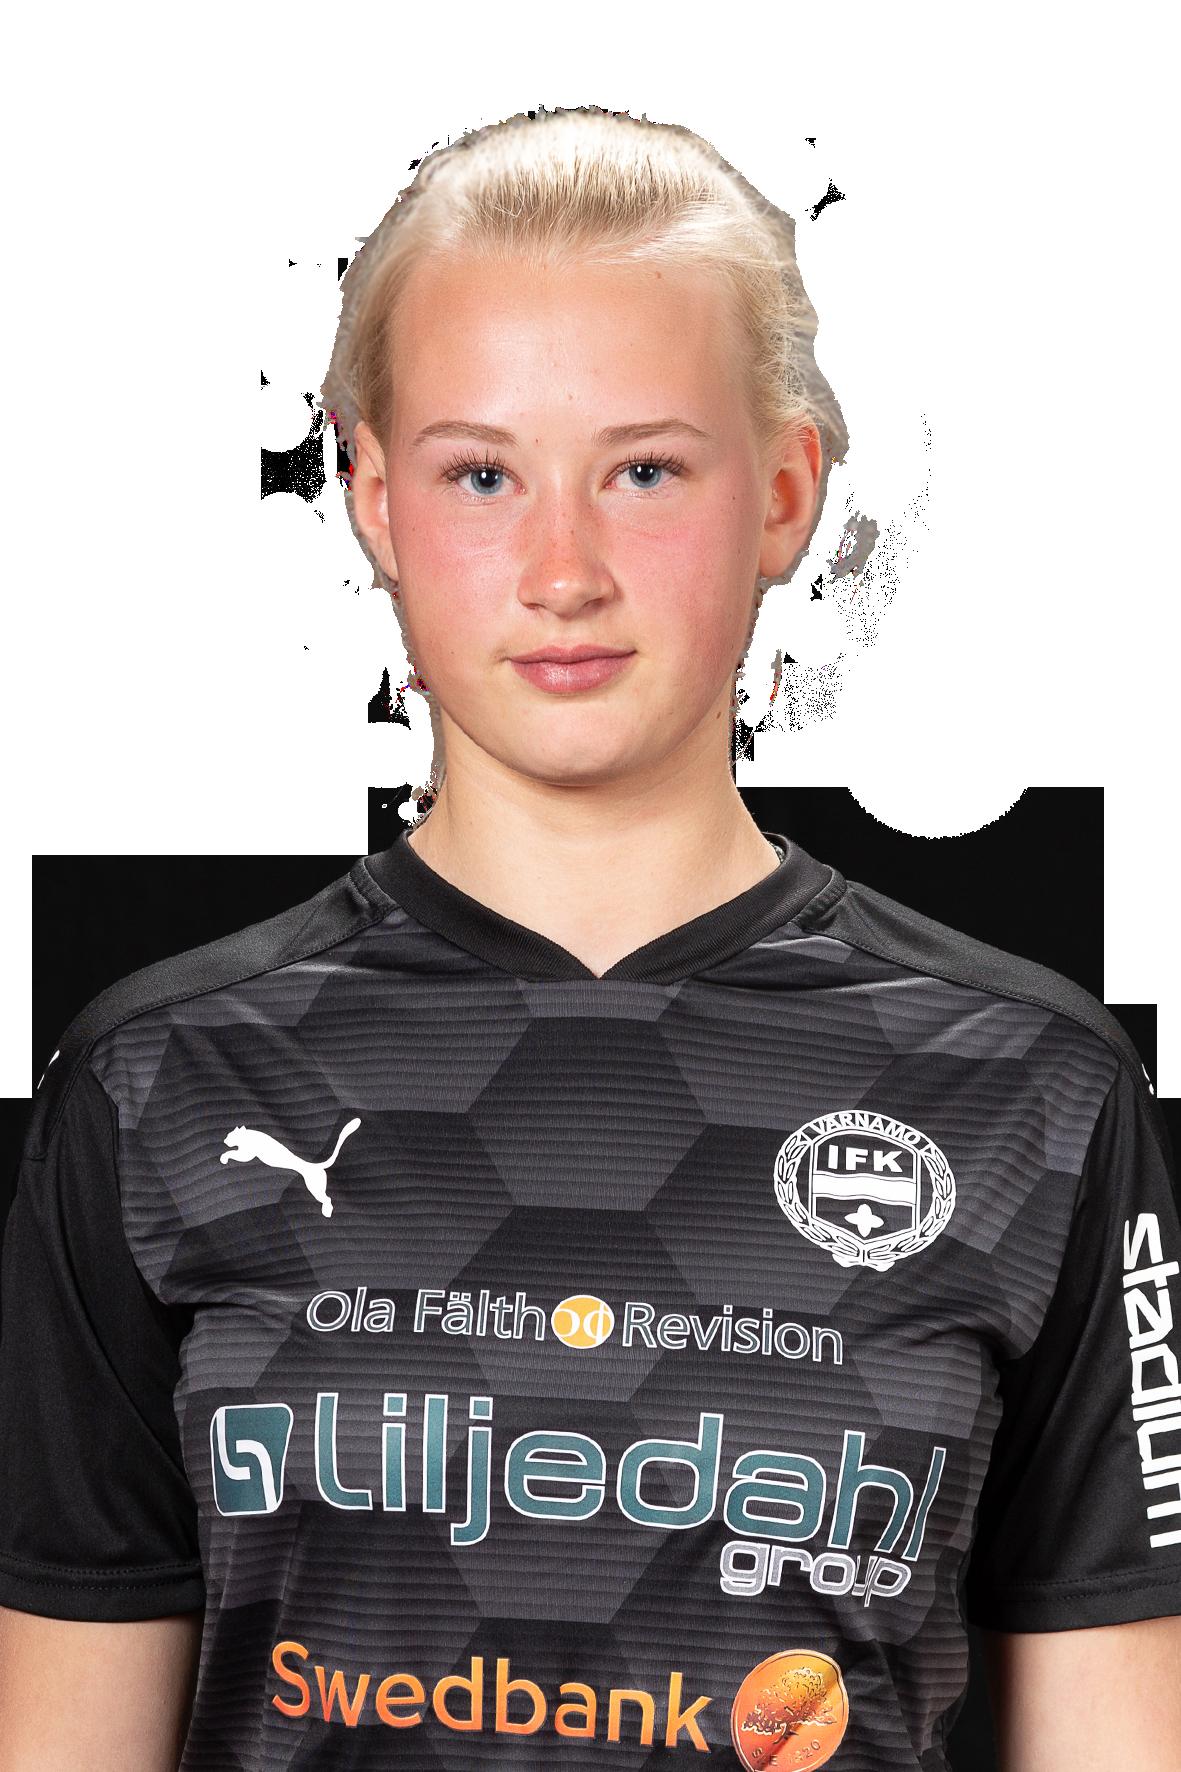 Tilda Torstensson